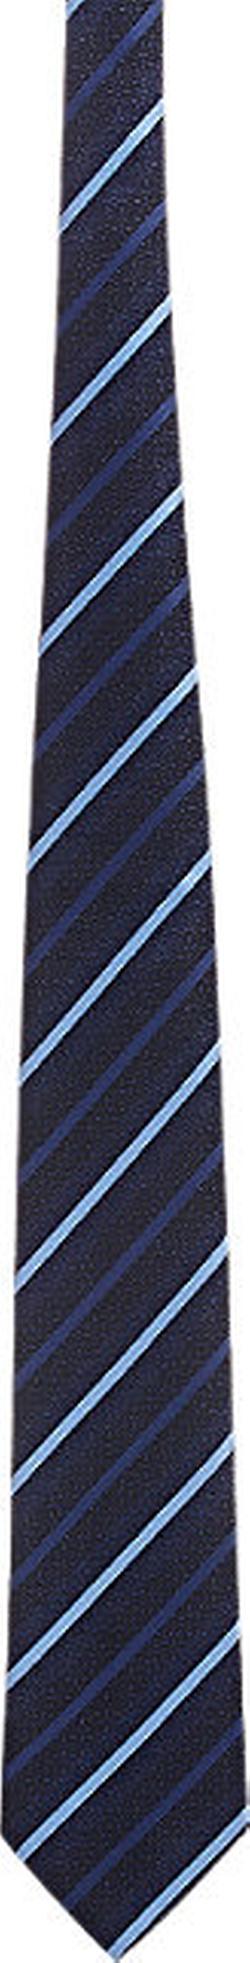 Diagonal-Striped Necktie by Ermenegildo Zegna in Suits